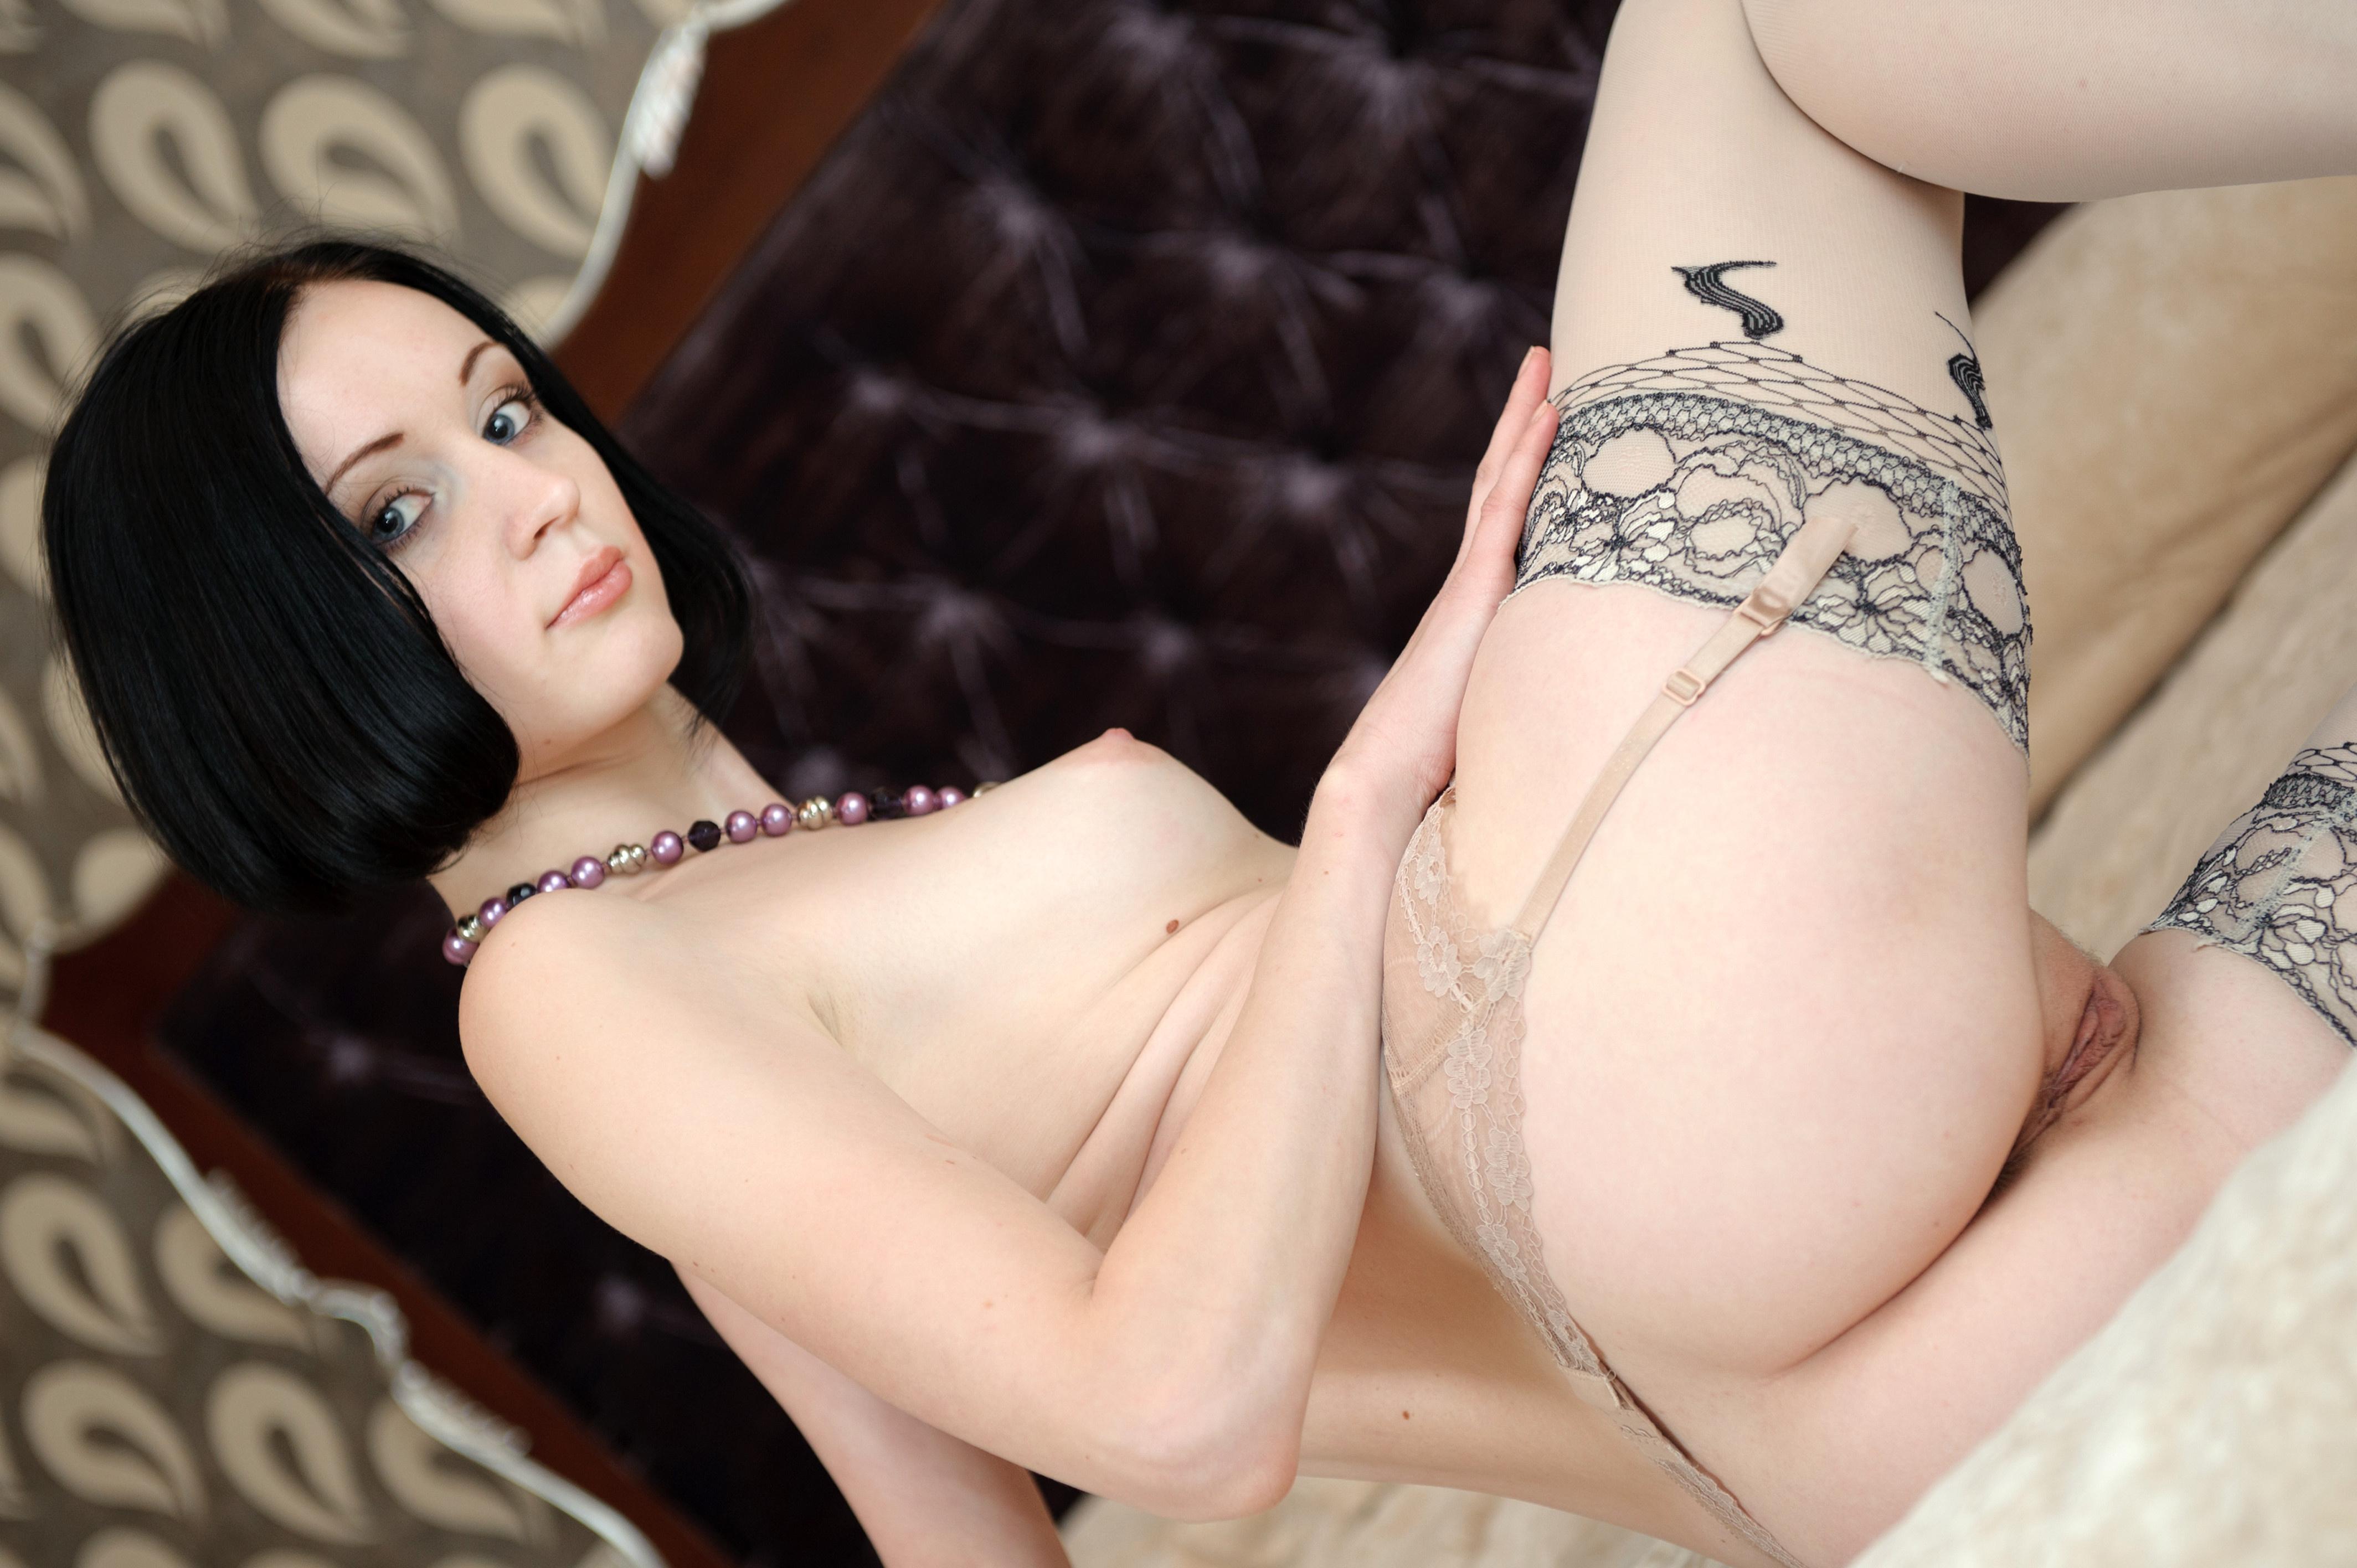 Wallpaper Margo E, Lingerie, Erect Nipples, Small Tits -5630